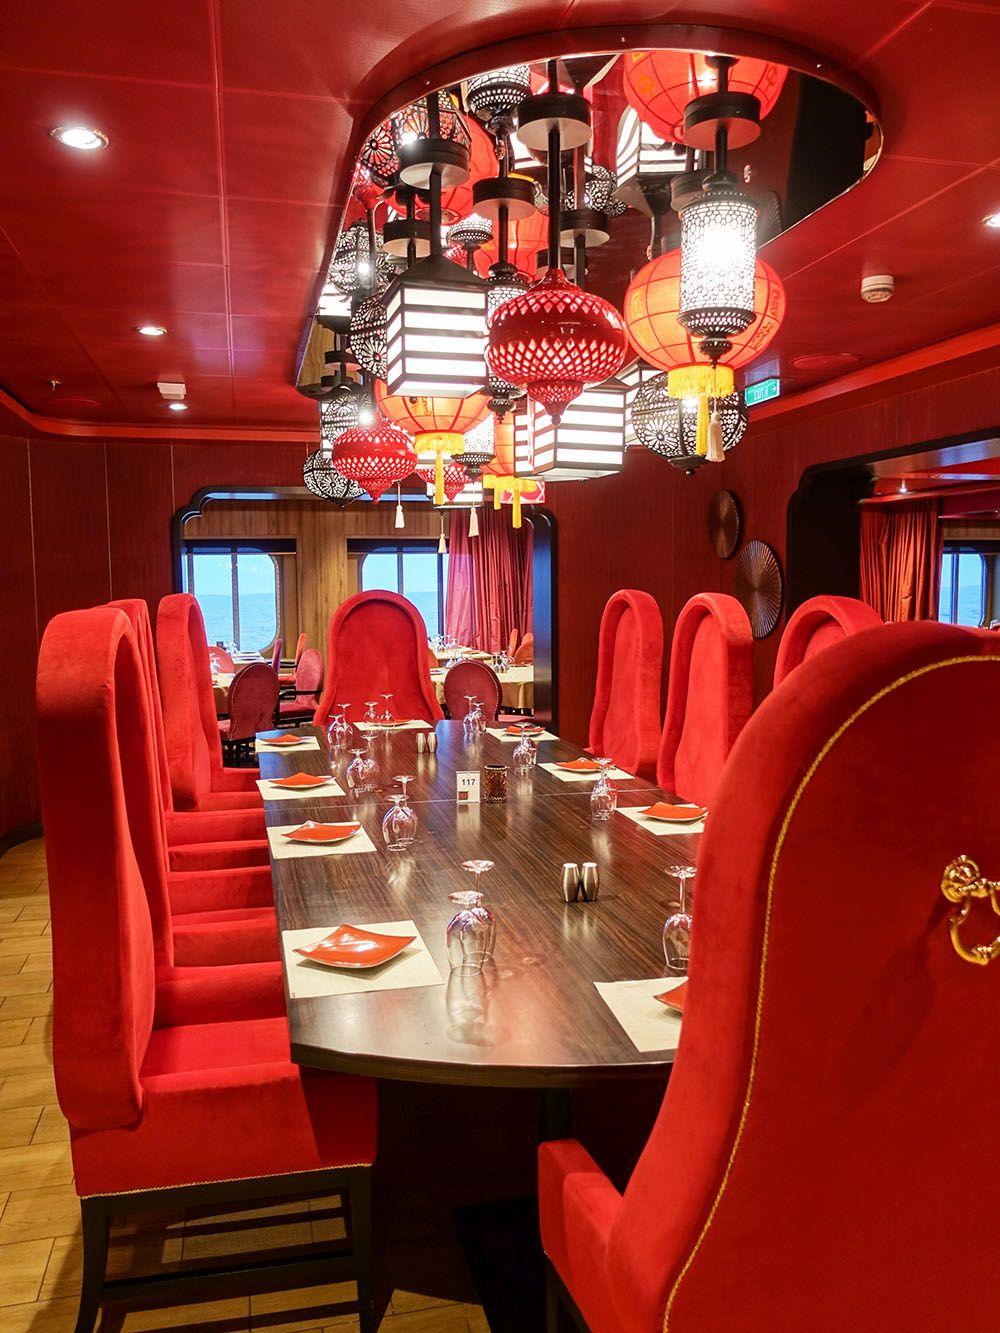 Wonderland Restaurant  Anthem Of The Seas Royal Caribbean Http Classy Explorer Of The Seas Dining Room Design Decoration